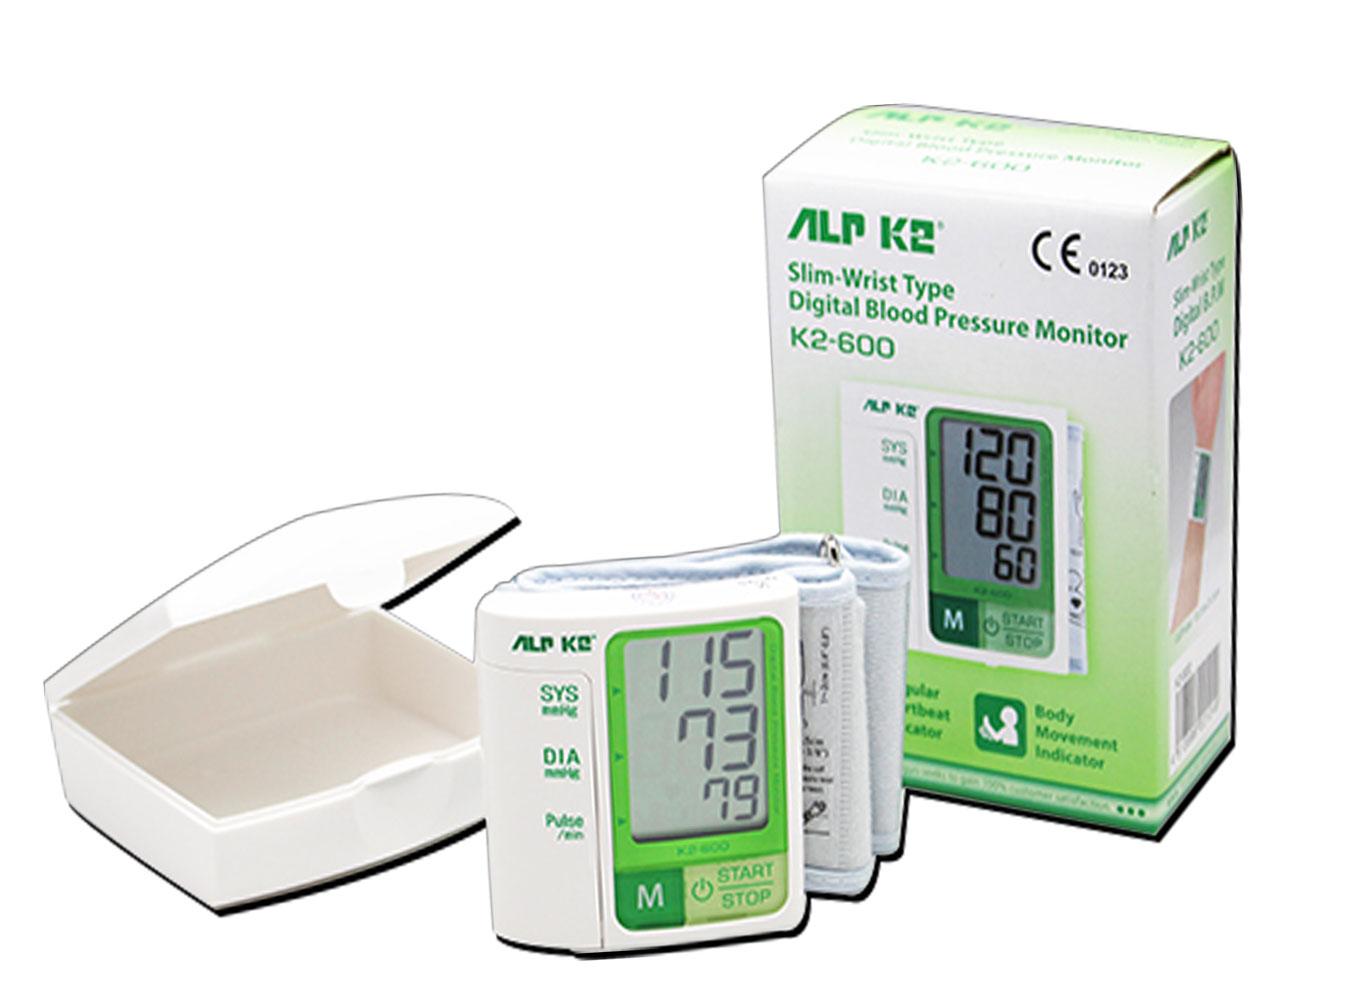 Máy đo huyết áp cổ tay ALPK2 K2-600-made in Japan